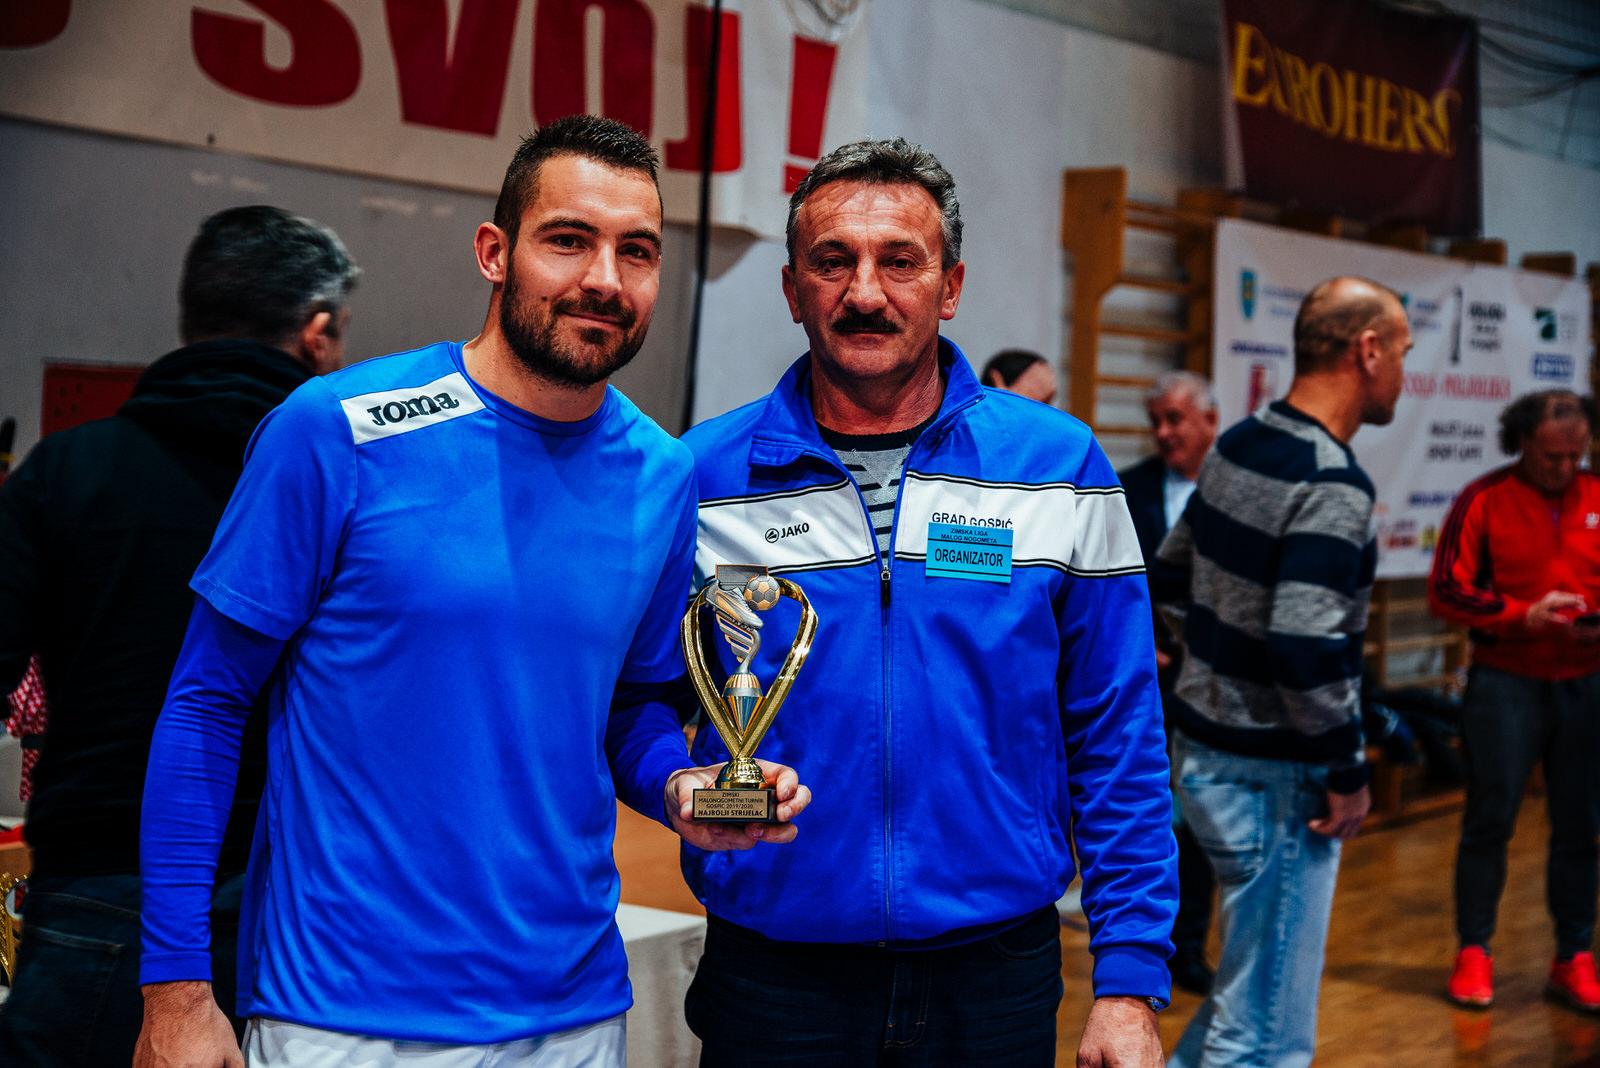 likaclub_zimska-malonogometna-liga-gospić_2019-20-128